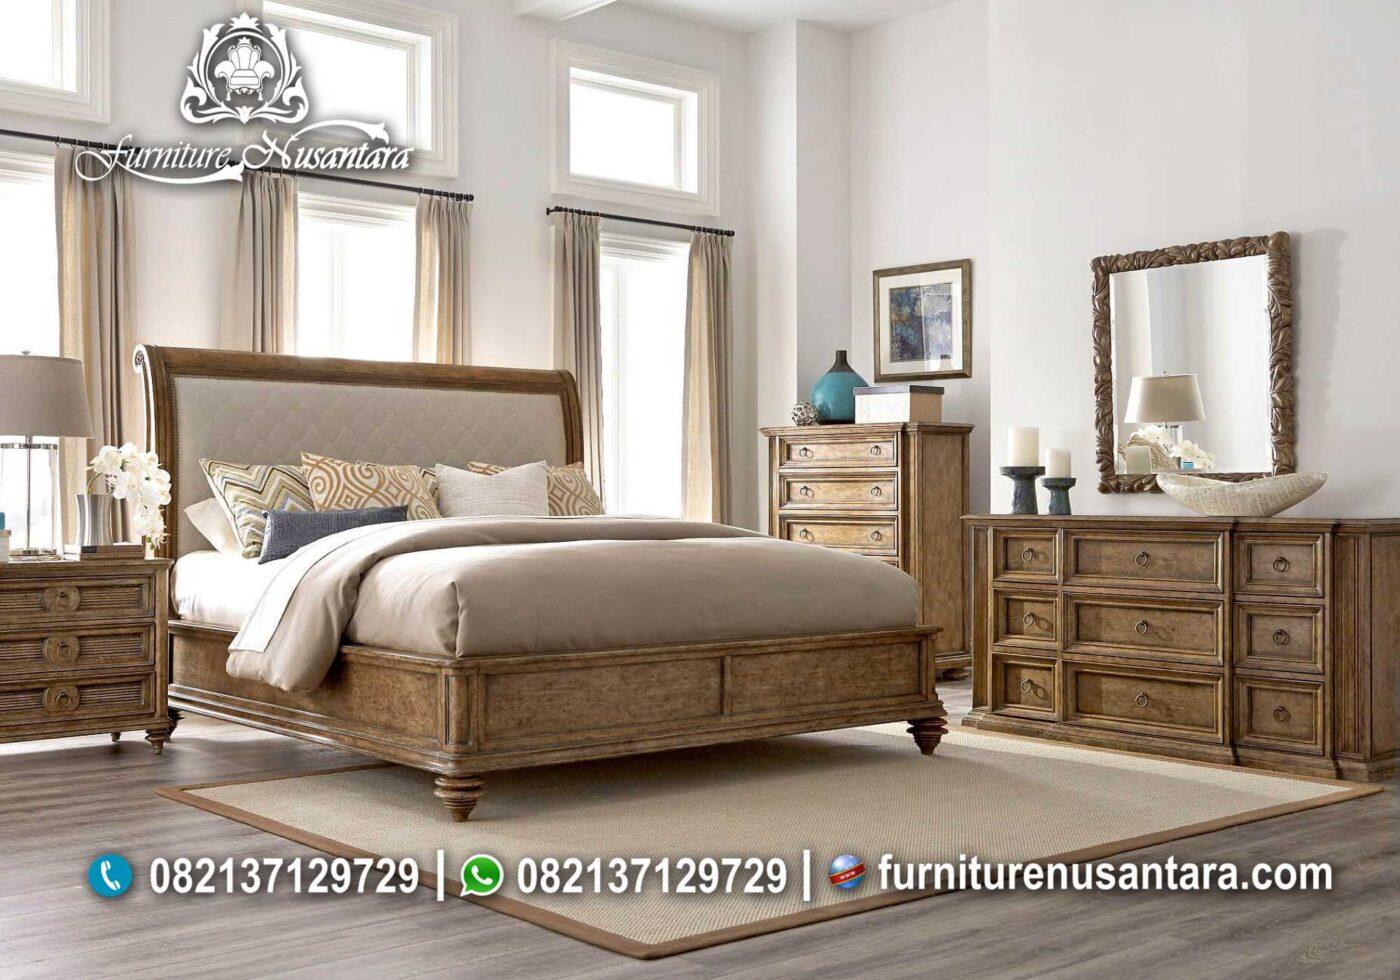 Kamar Set Jati Jepara KS-48, Furniture Nusantara